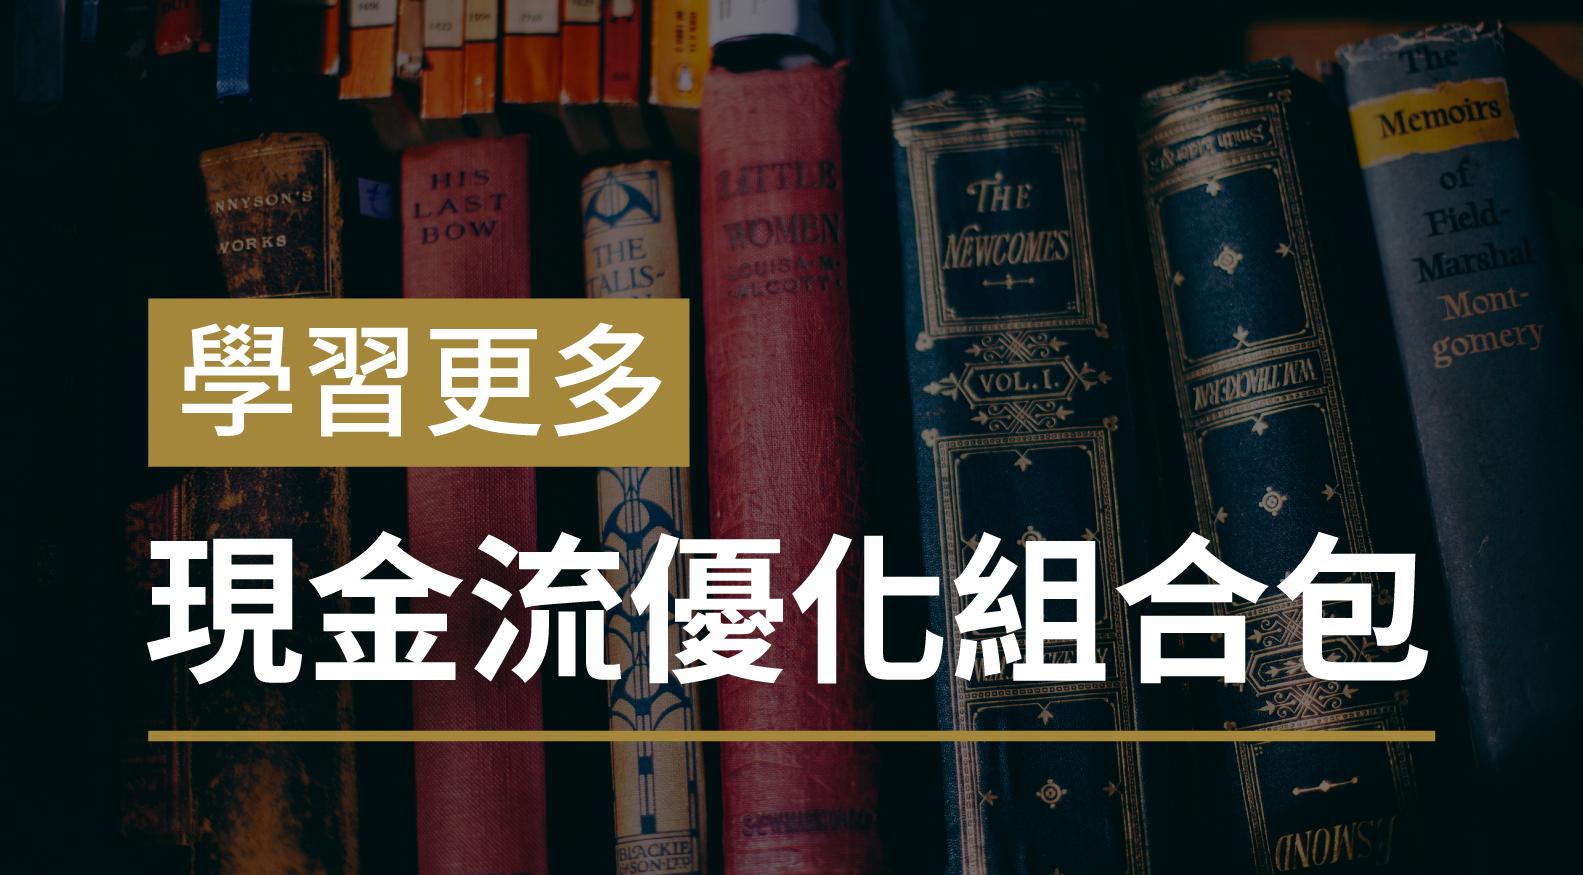 6.【BOS 學習更多3】現金流優化組合包-銀行股、REITs、MLP (1h3m49s)